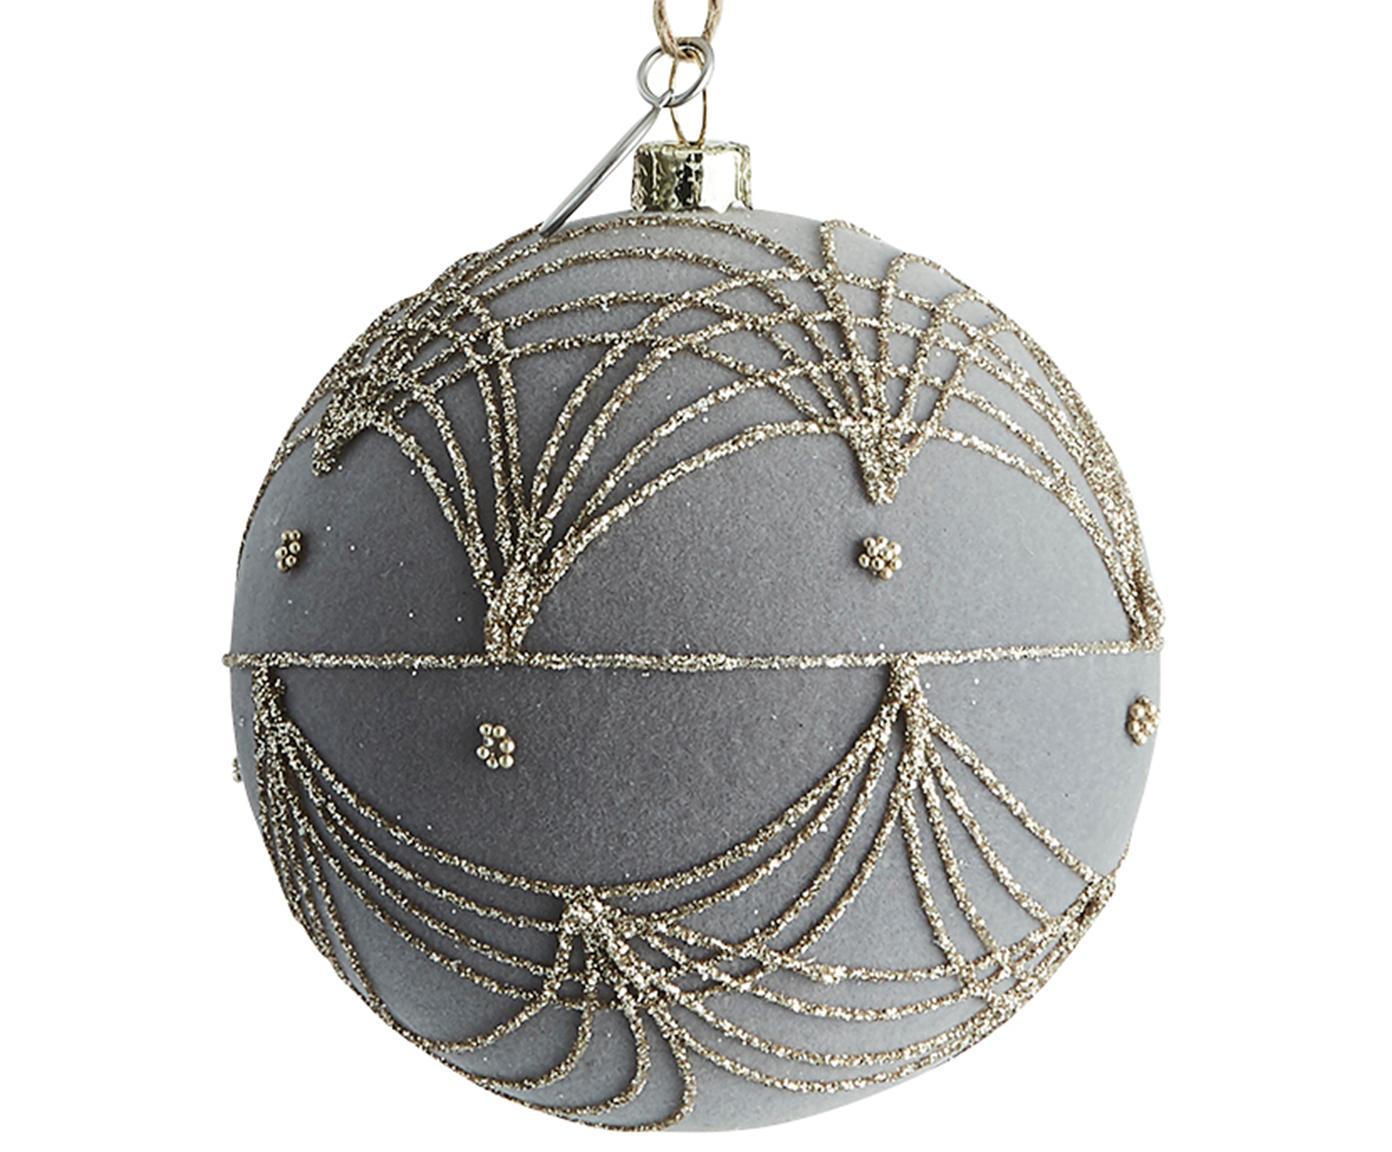 Kerstbal Jalia, Kunststof, polyester fluweel, Grijs, goudkleurig, Ø 8 cm